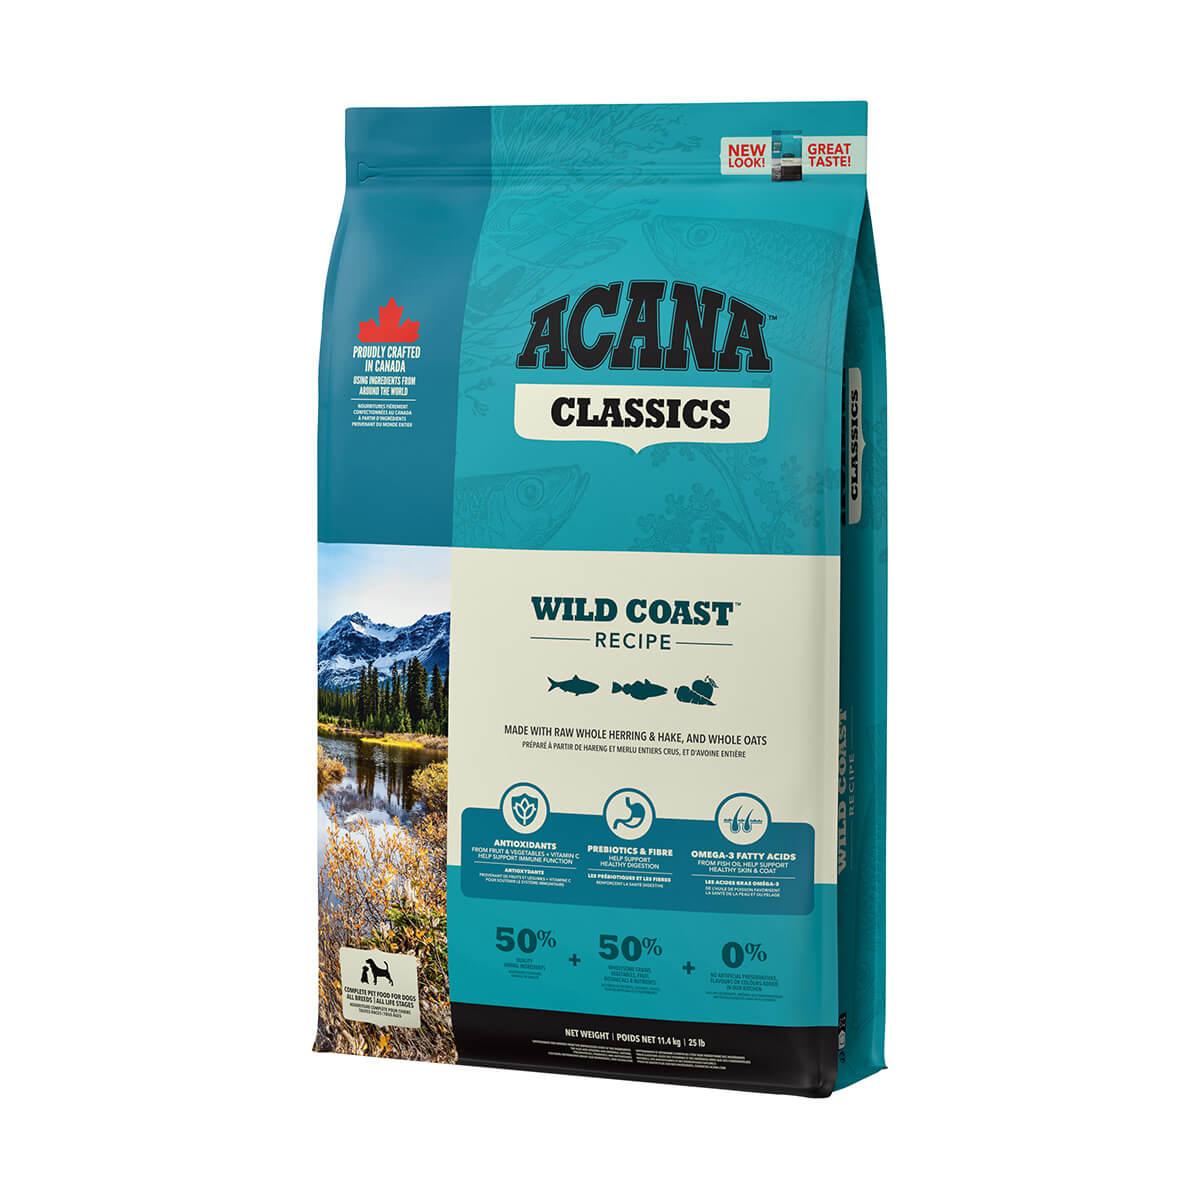 Acana Pacifica Dog Food - 11.4 kg